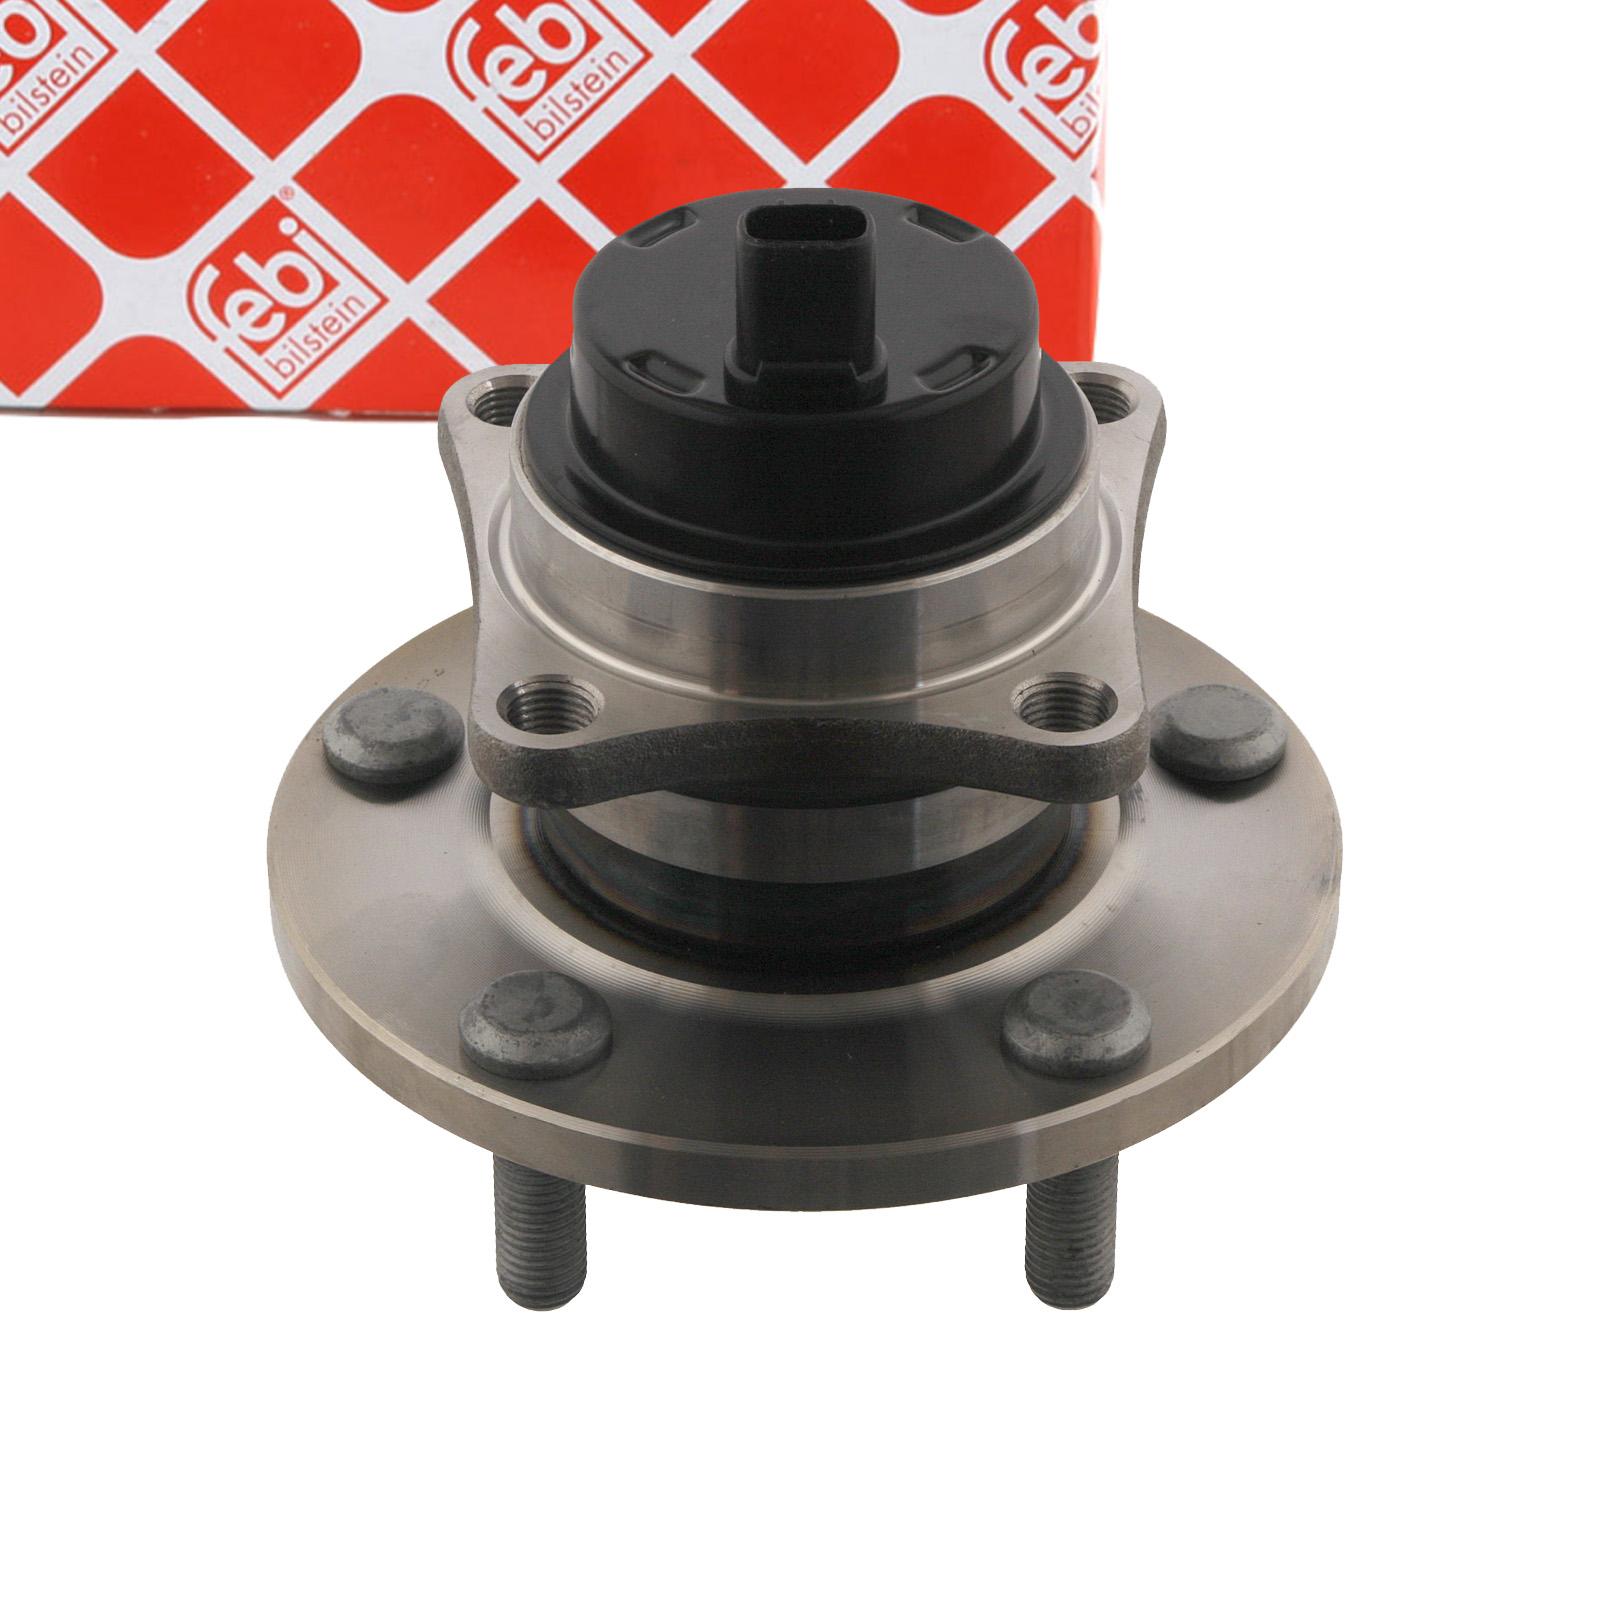 FEBI 31338 Radlagersatz Radnabe TOYOTA Corolla Verso 1.6-1.8 / 2.0-2.2 D-4D hinten